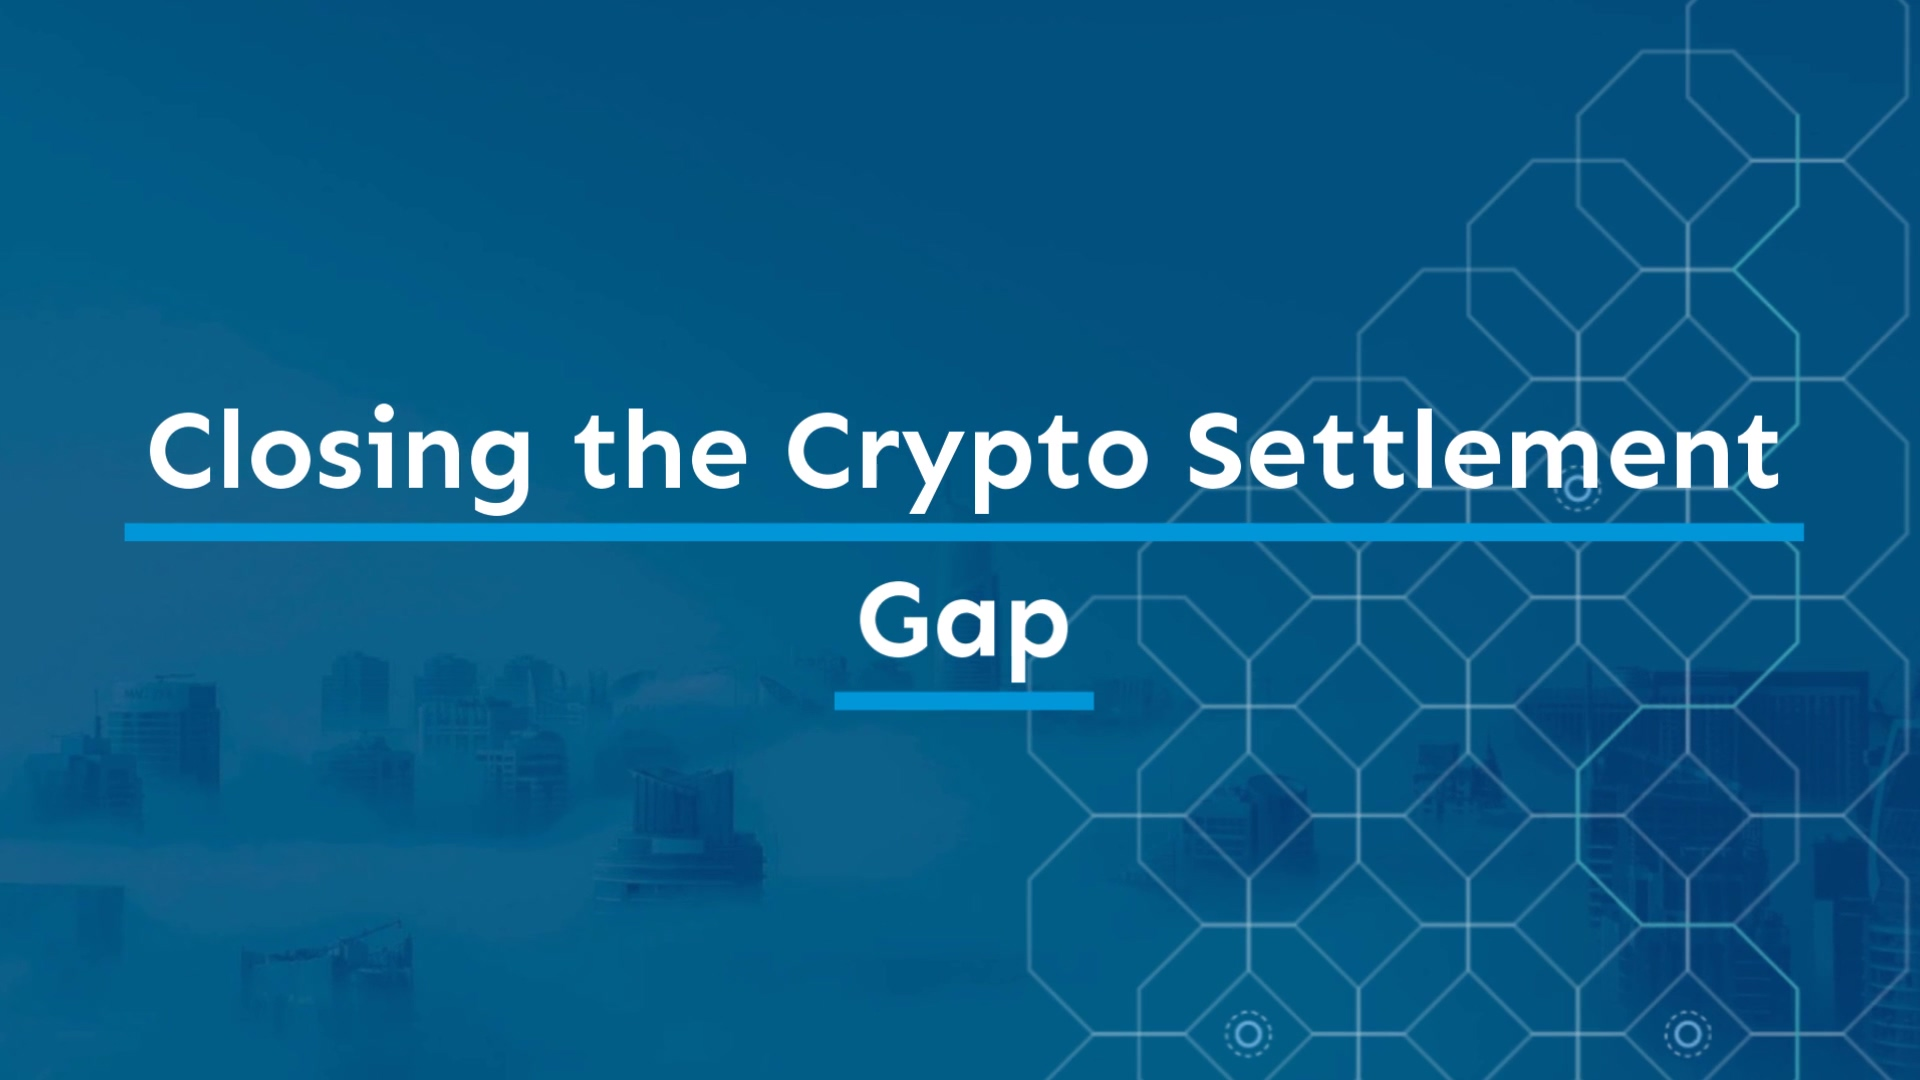 Closing_the_Crypto_Settlement_Gap_1080p